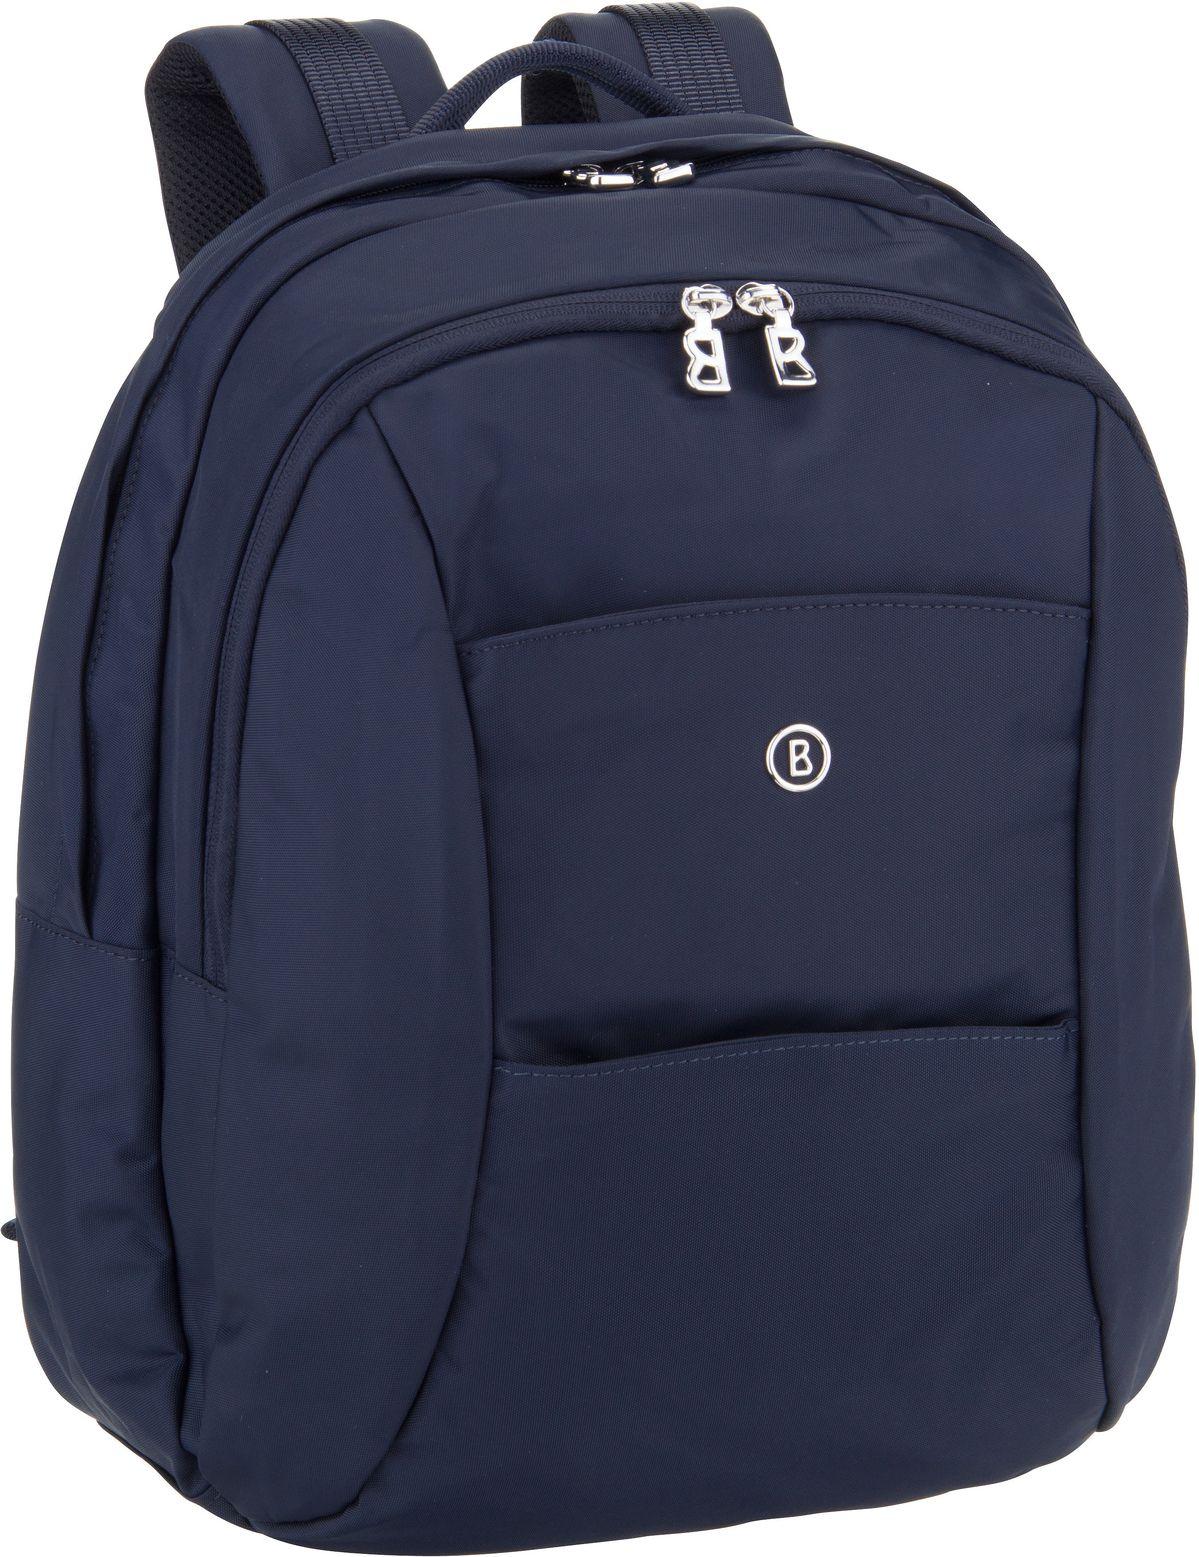 Rucksack / Daypack Verbier Arnt BackPack SVZ Dark Blue